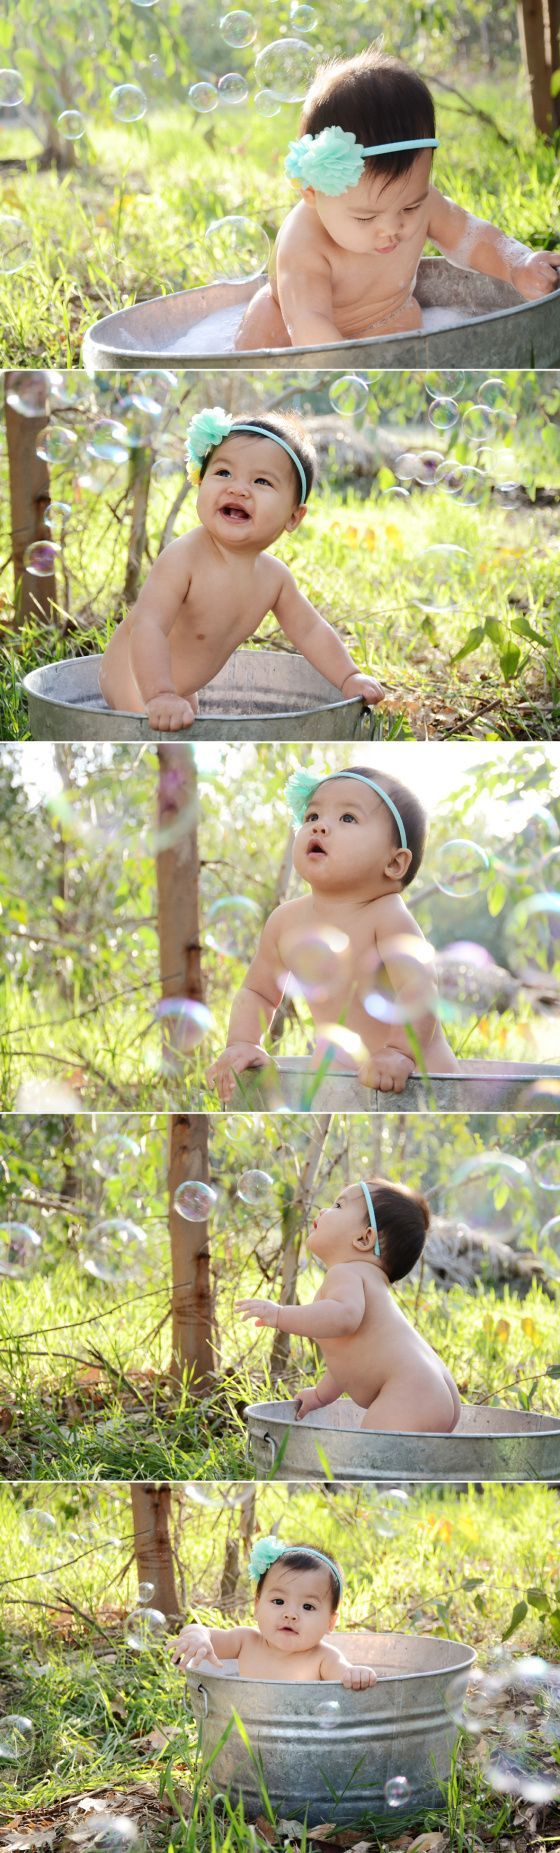 Outdoor Bubble Bath Photos 9 Month Baby Photography https://creatingforourcreator.wordpress.com/2014/04/02/amelias-9-month-bubble-bath-and-easter-photos-menifee-baby-photography/